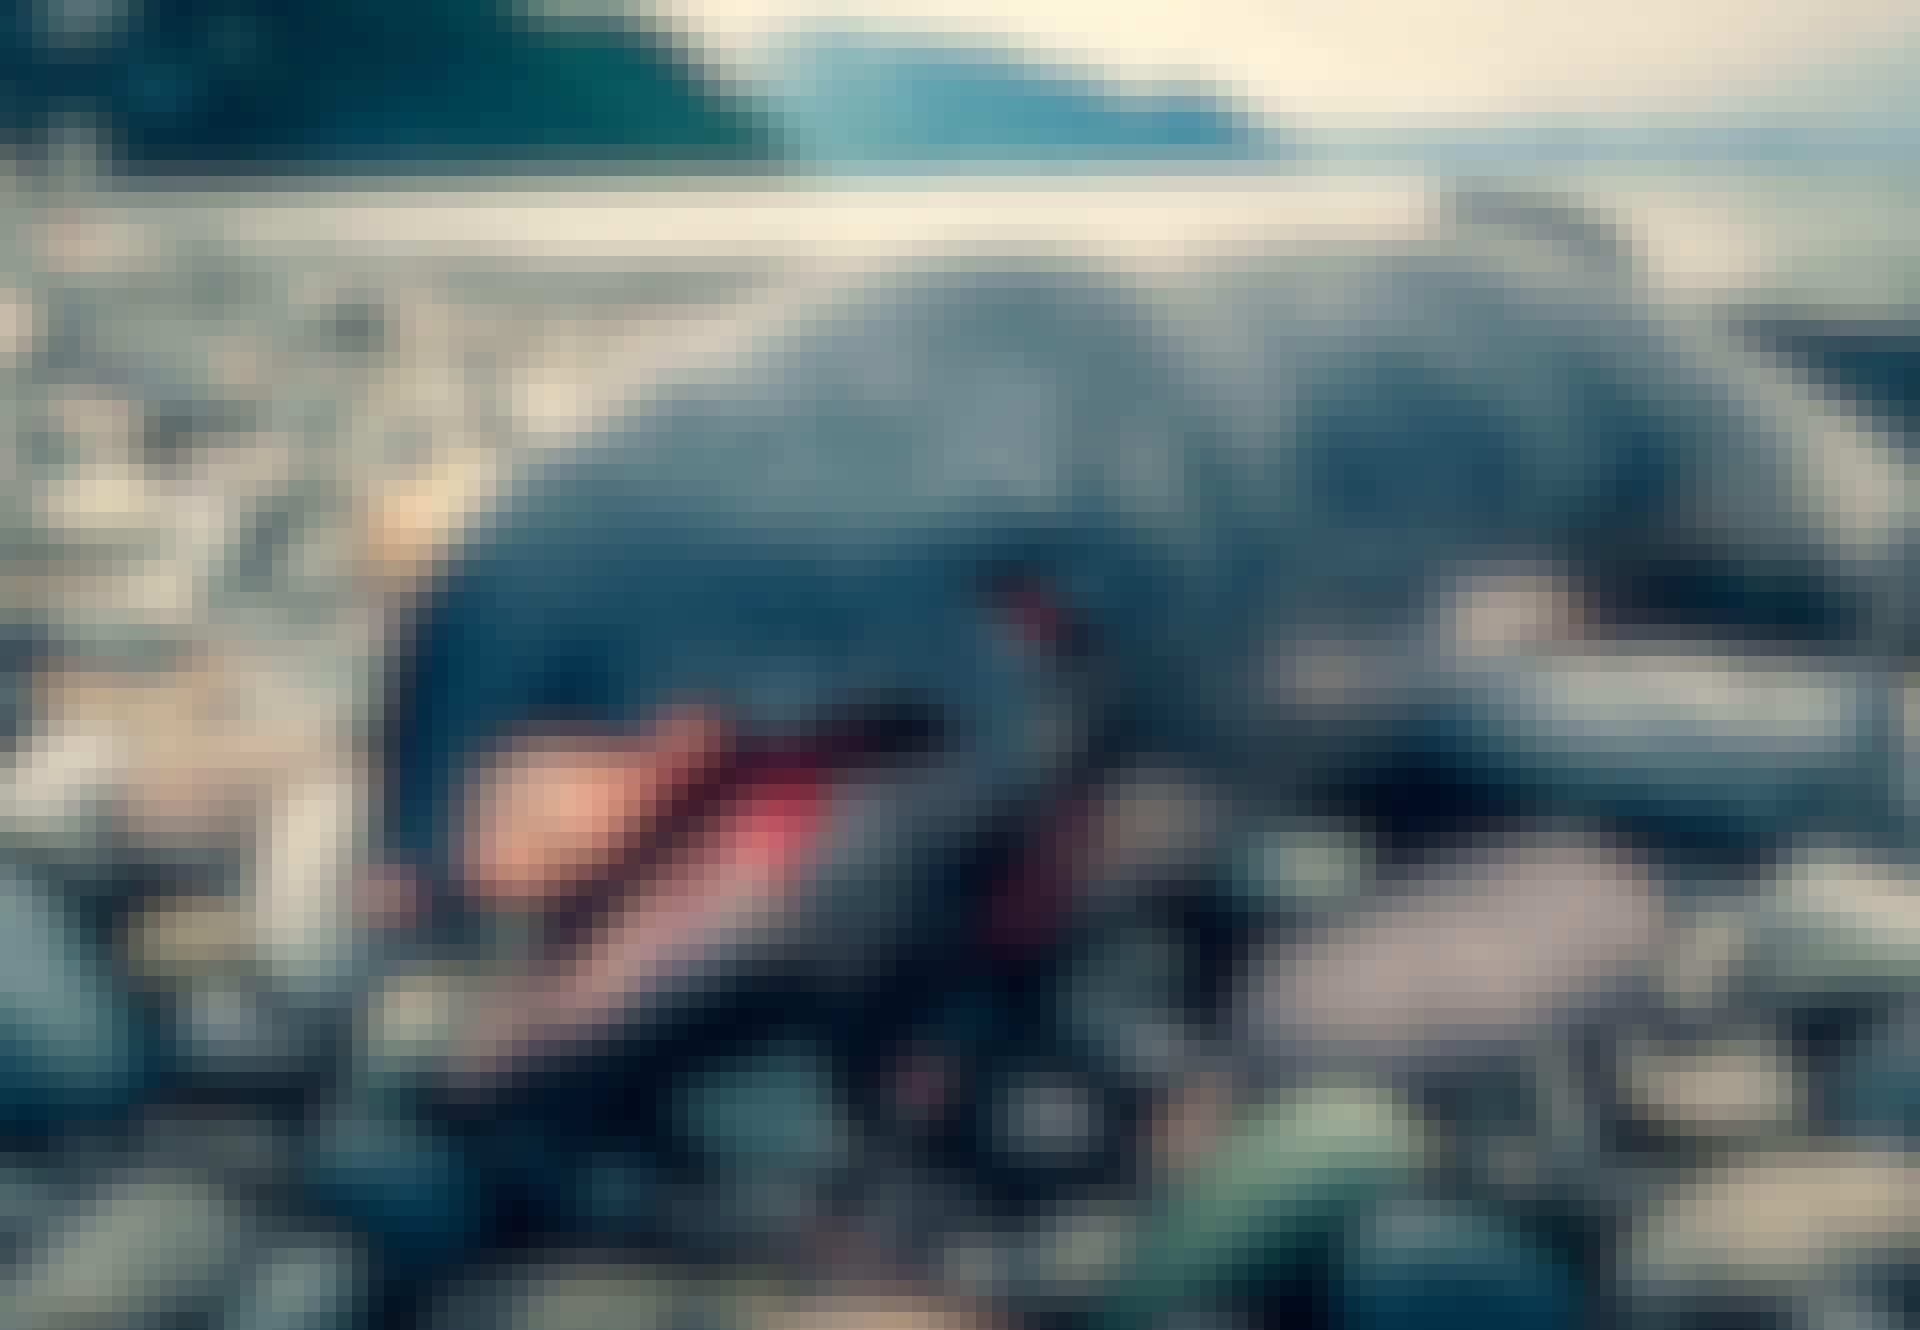 Død hval ligger på stranden